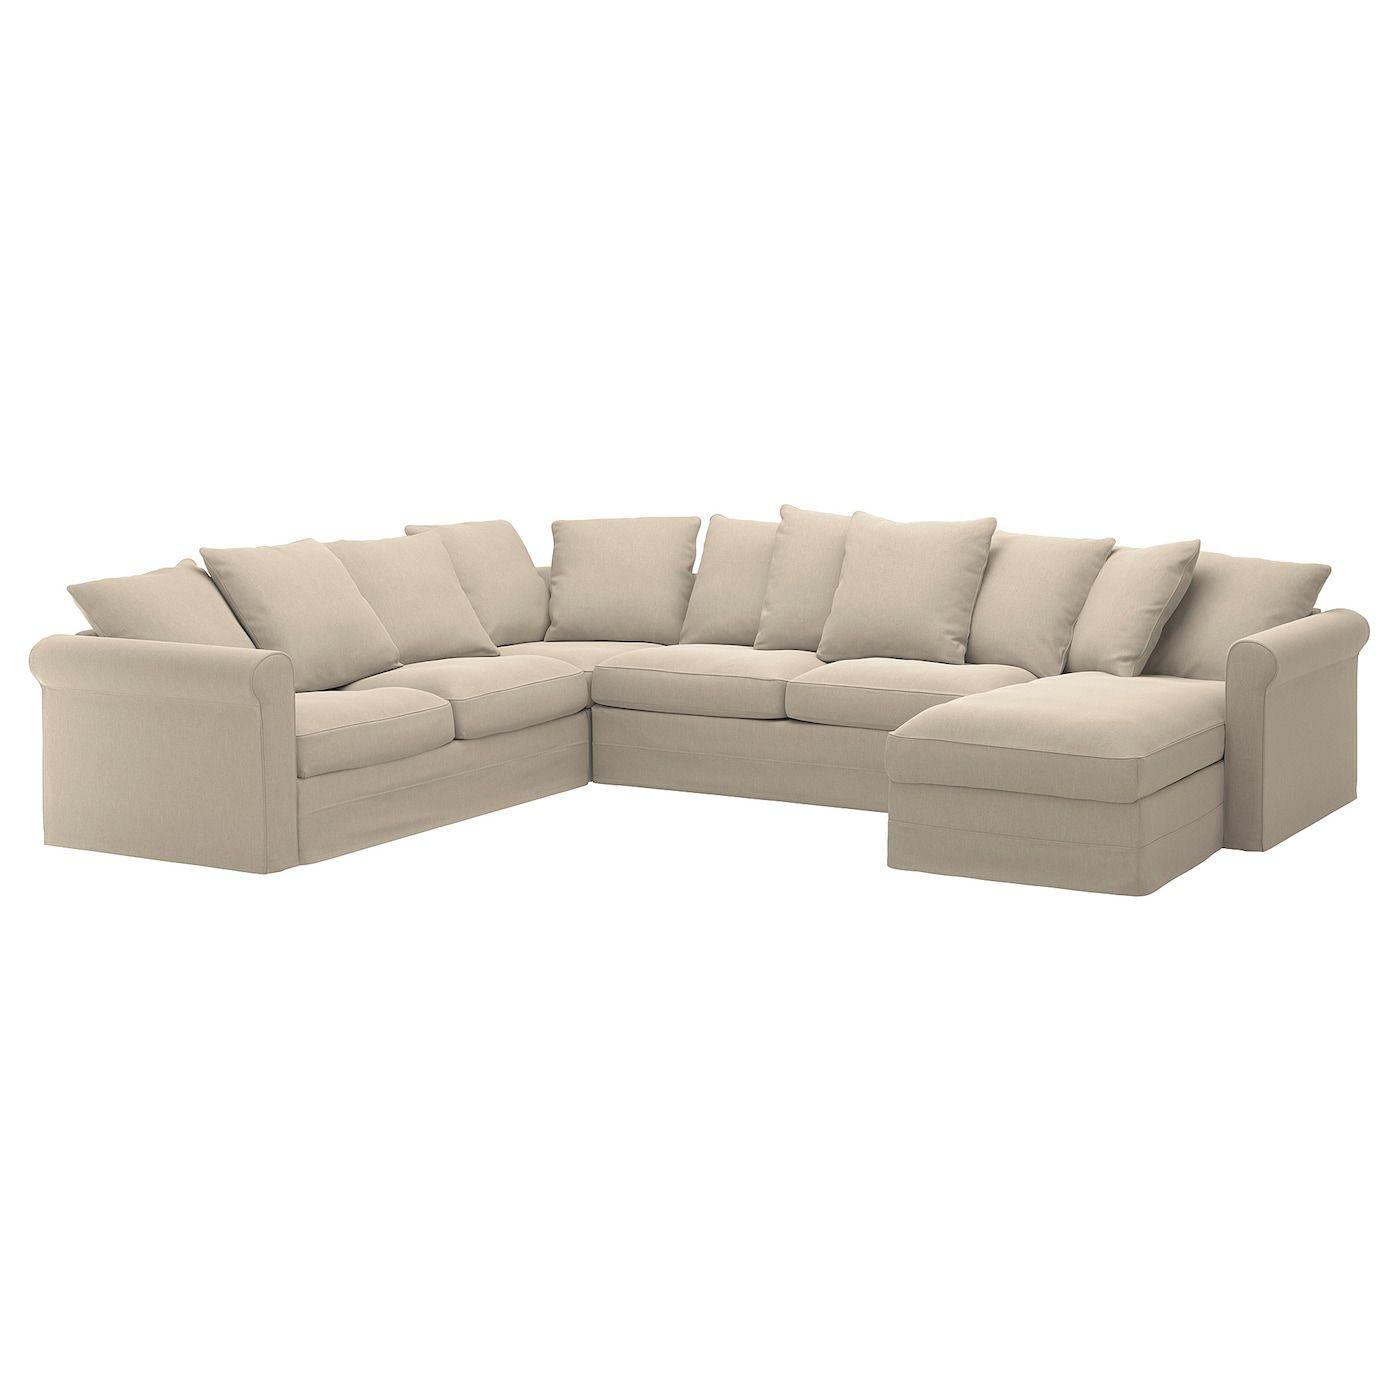 - GRÖNLID Corner Sleeper Sofa, 5-seat - With Chaise, Sporda Natural